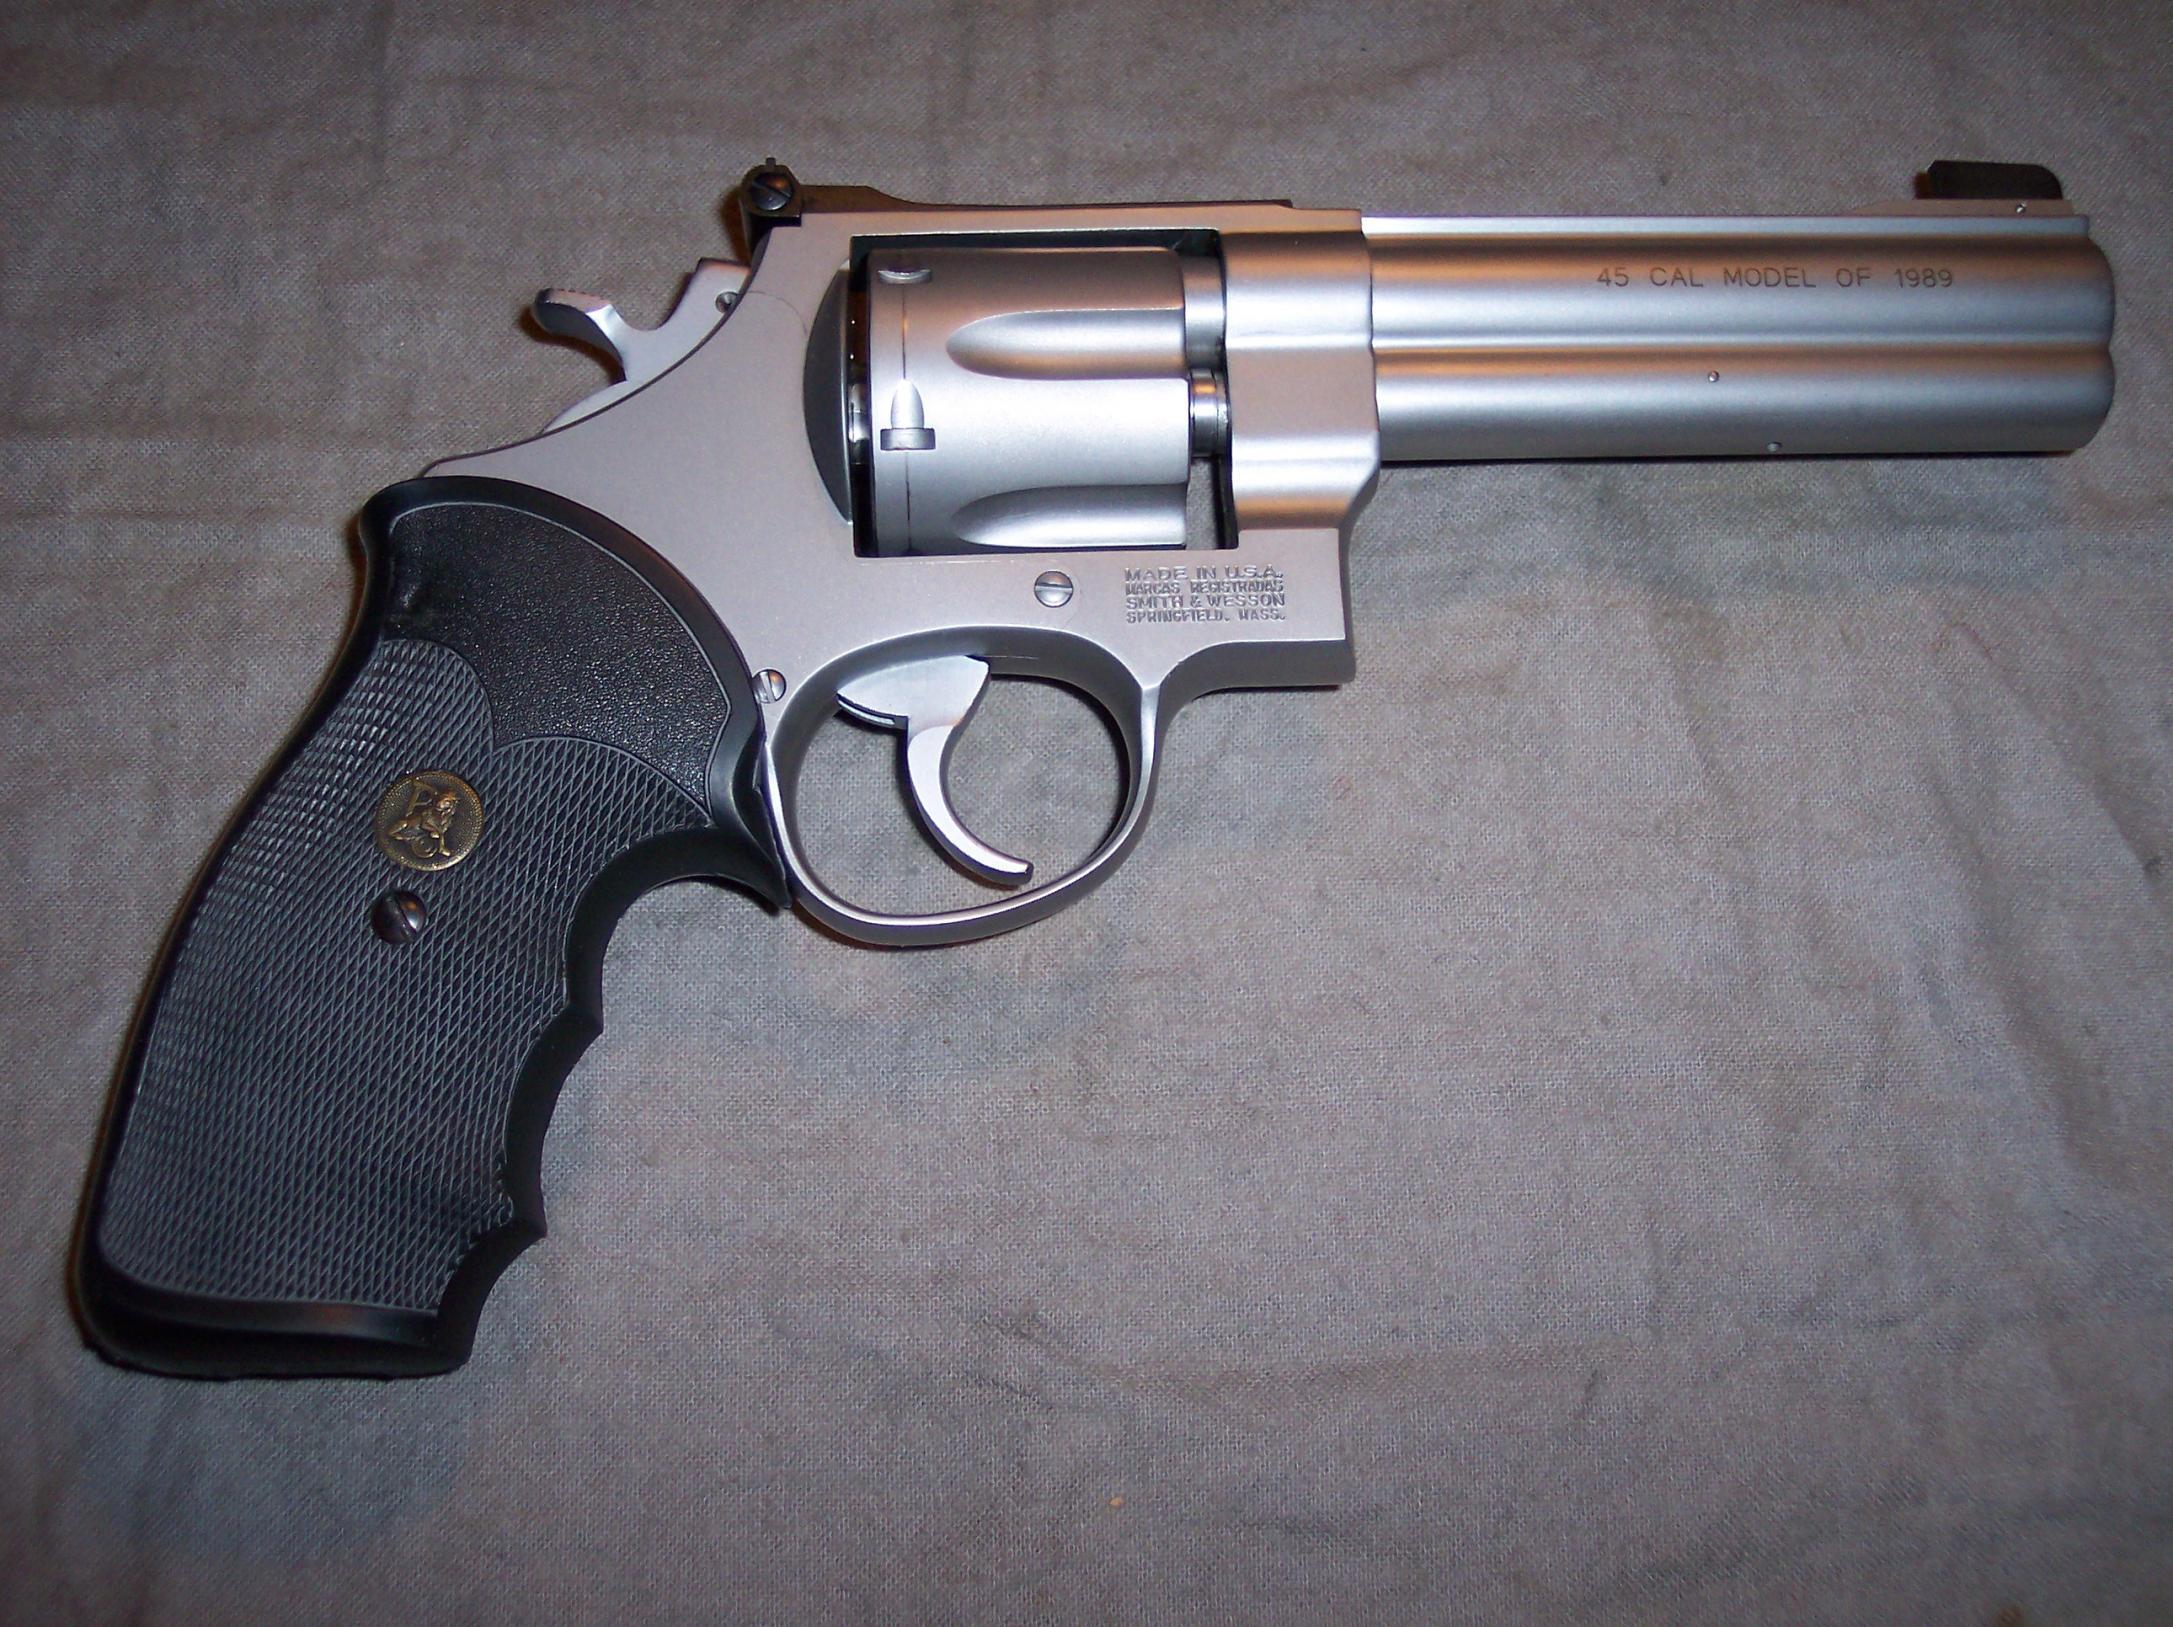 My New One: a Biggie:-s-w-model-625-.45acp-model-1989-b-ser-bec5066.jpg